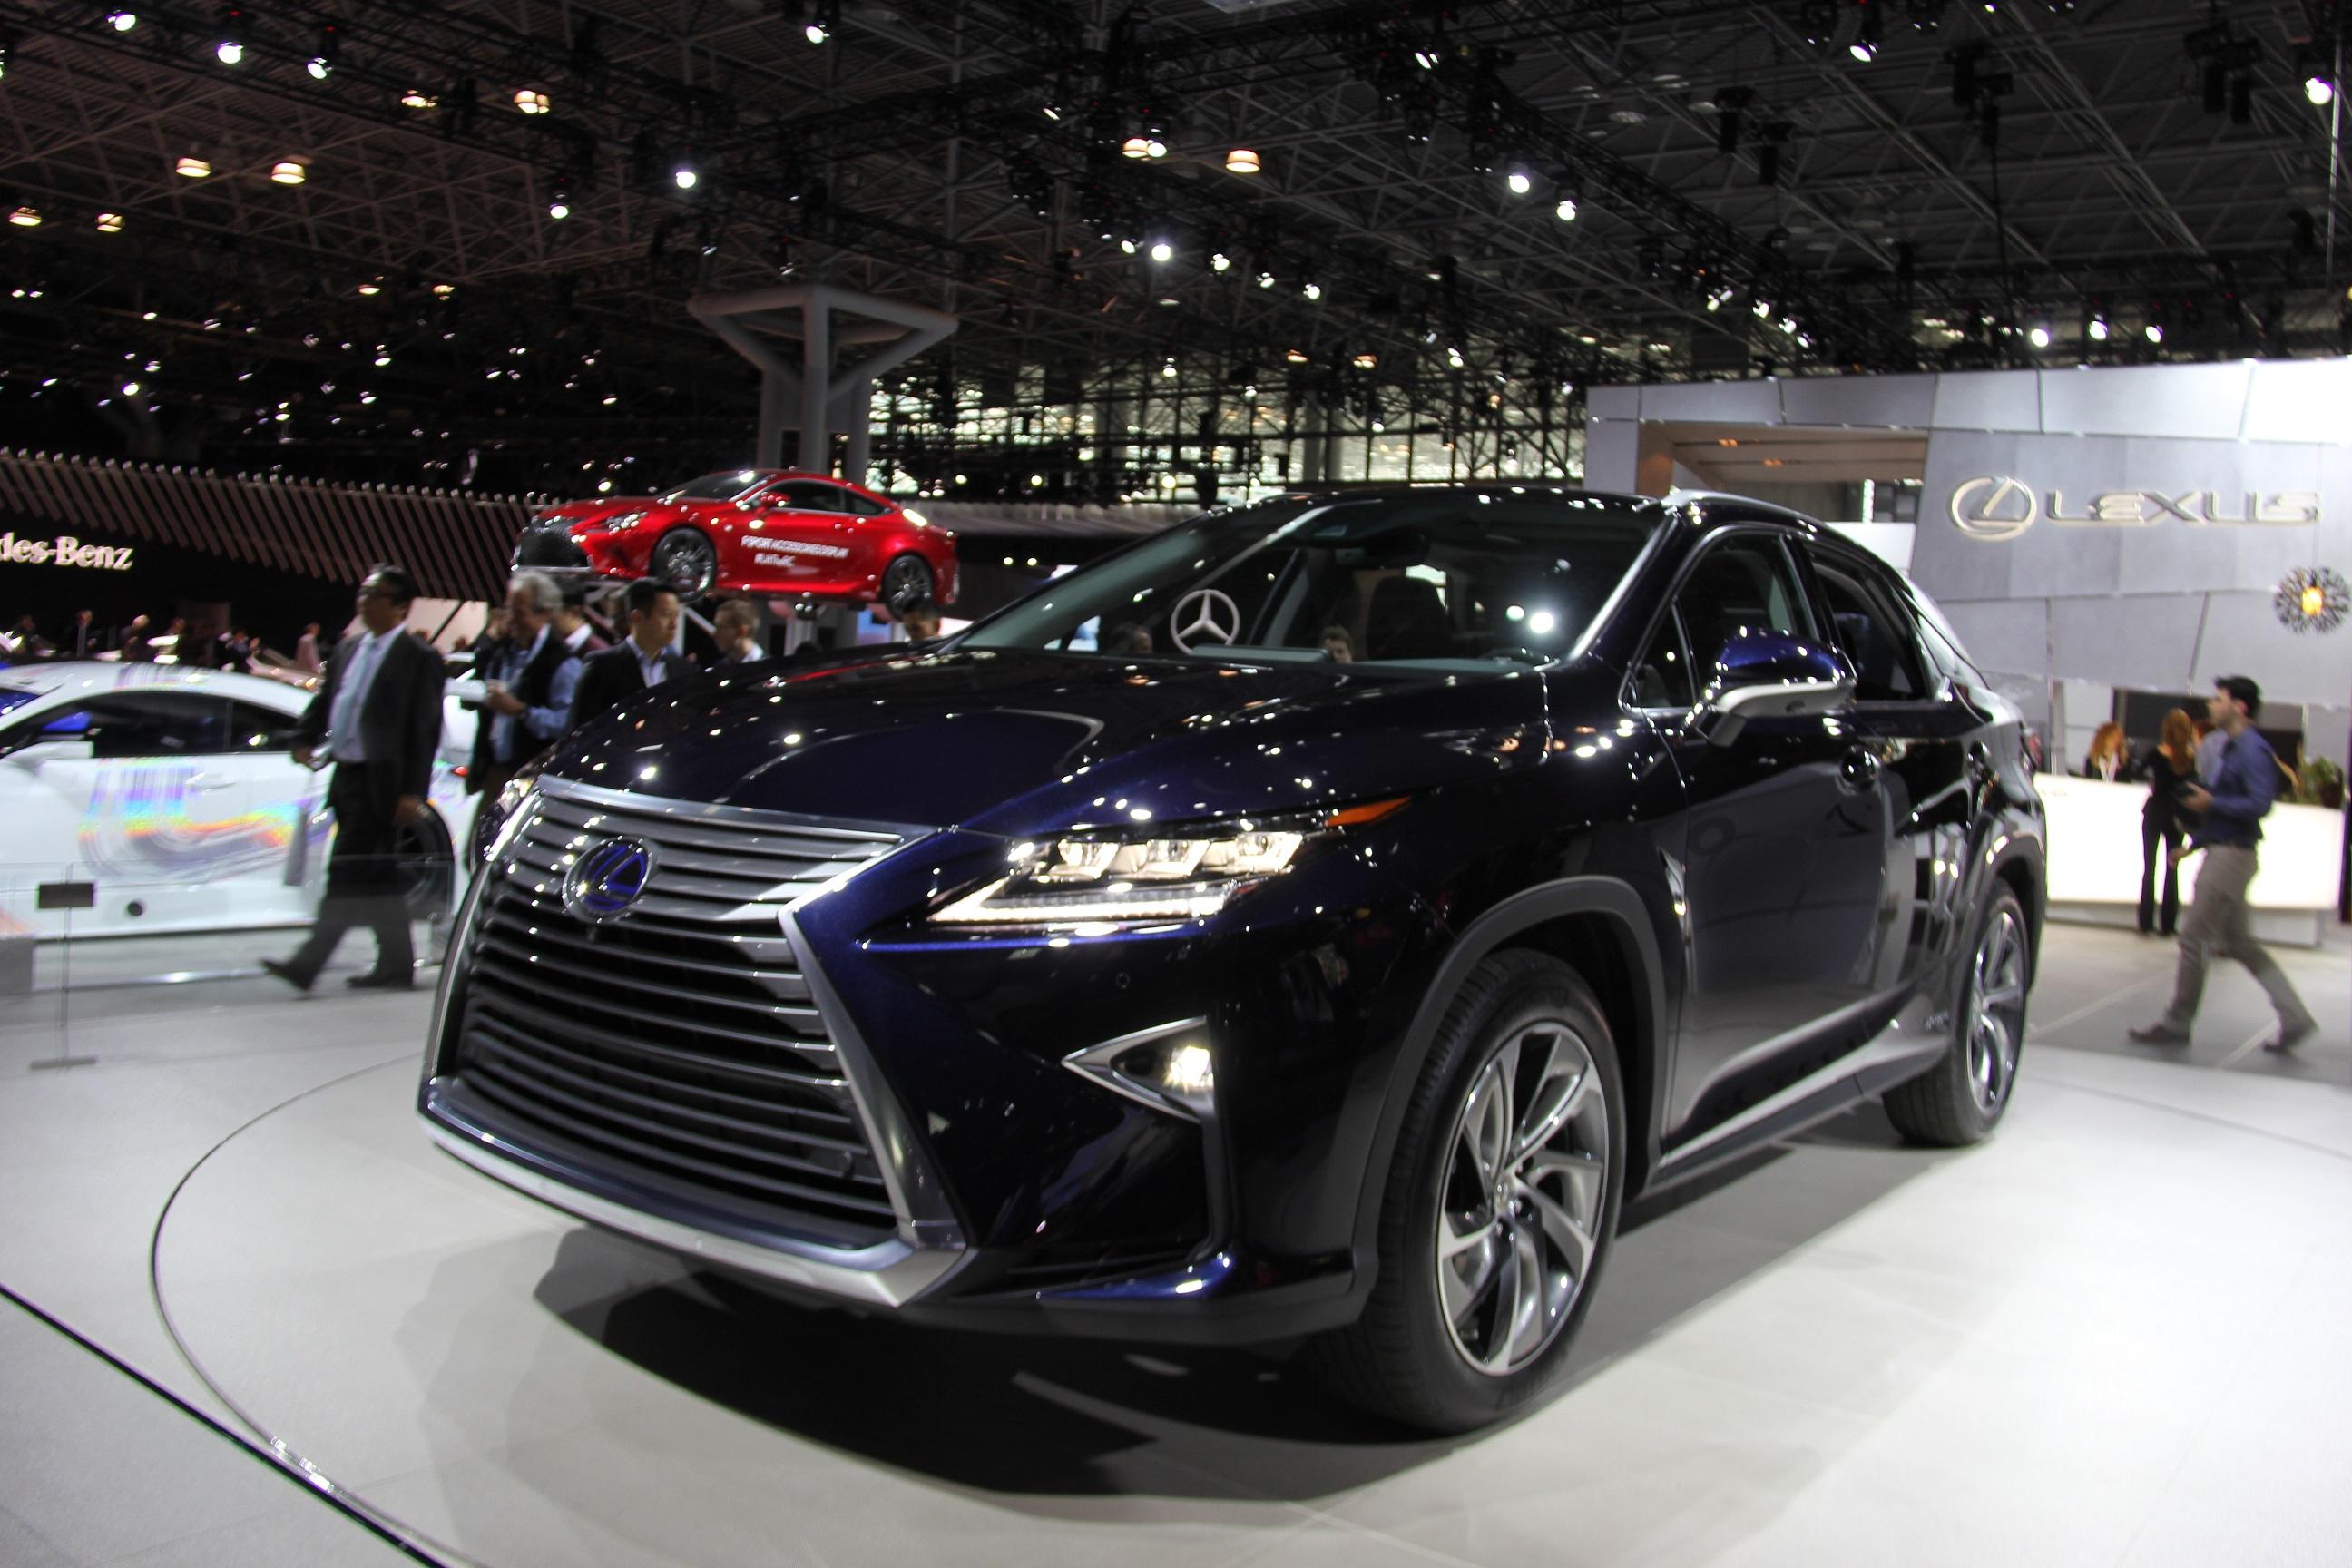 Mega Gallery 2016 Lexus RX Revealed at New York International